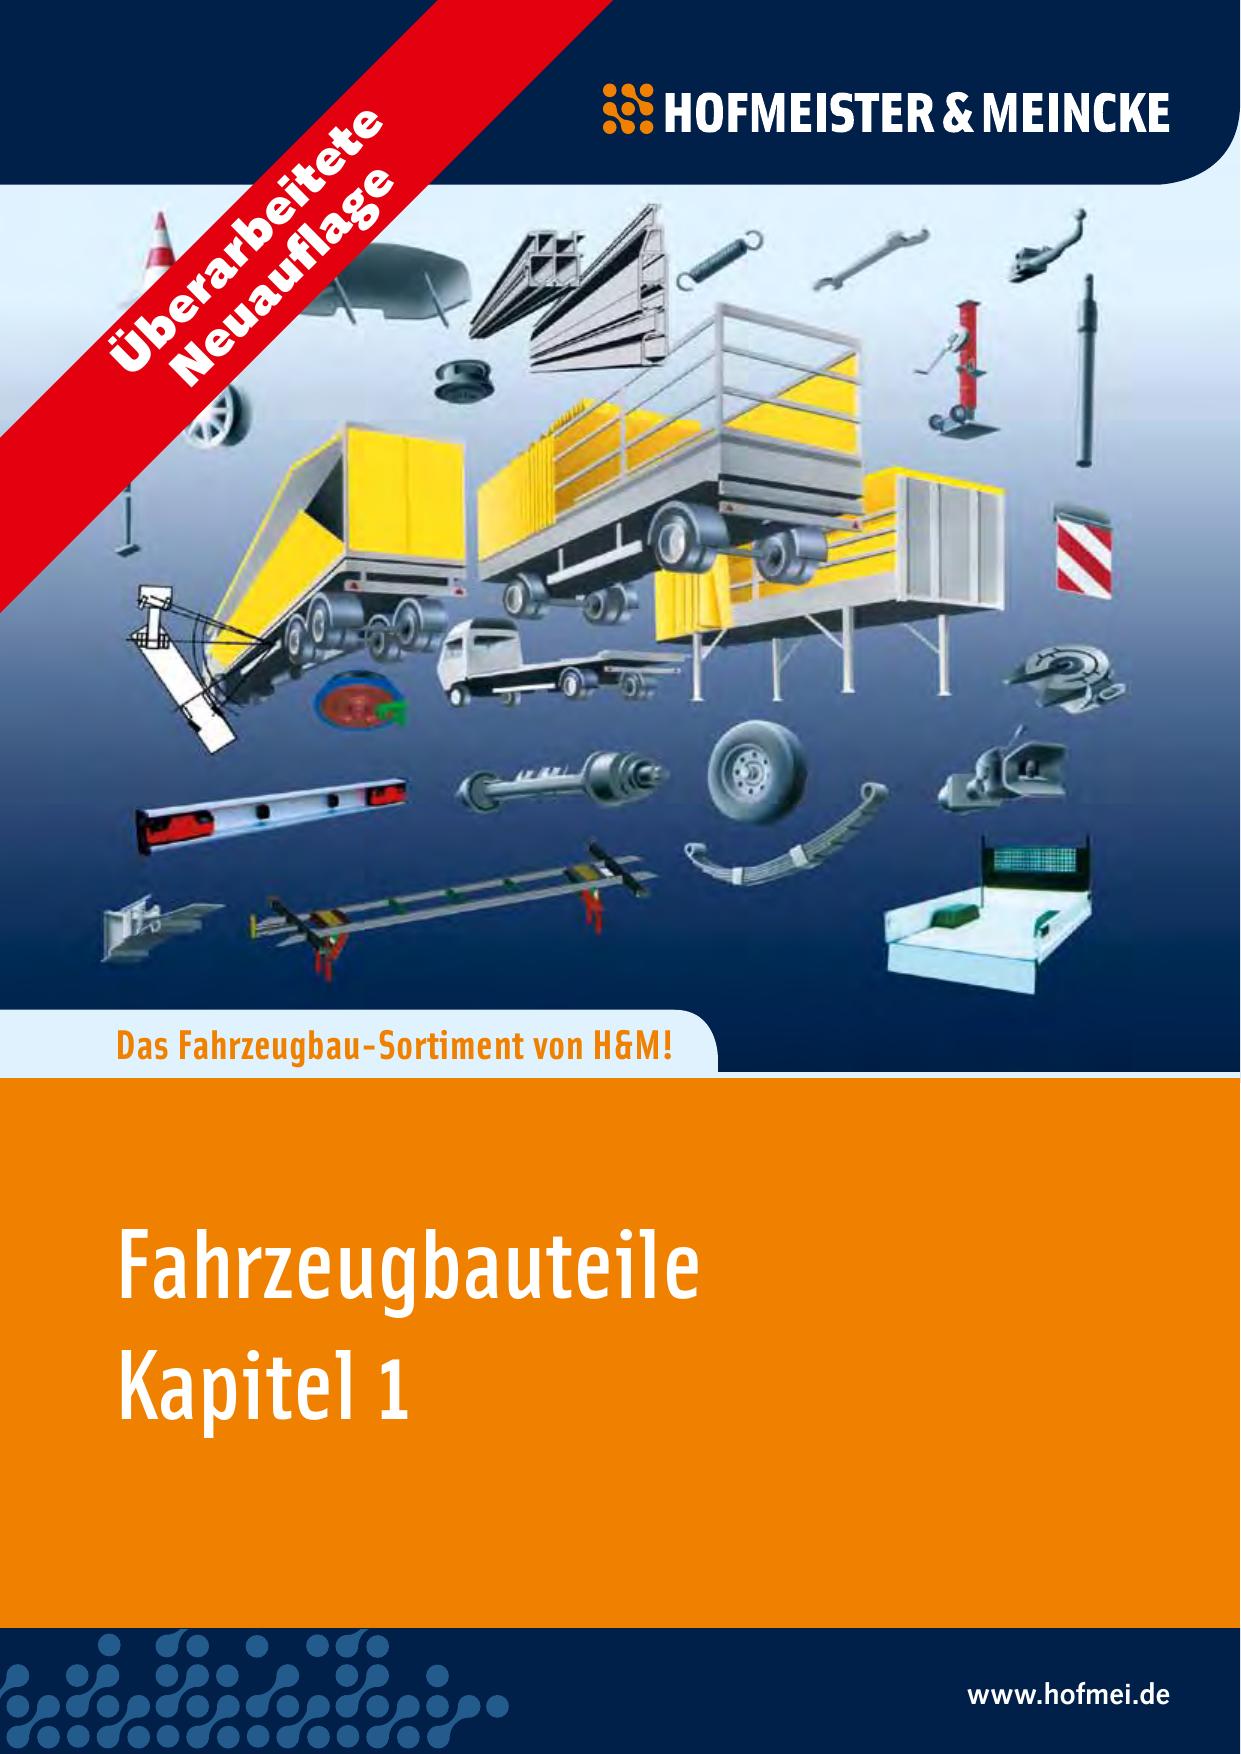 Fahrzeugbauteile Kapitel 1 - HOF-MEI-KO   manualzz.com